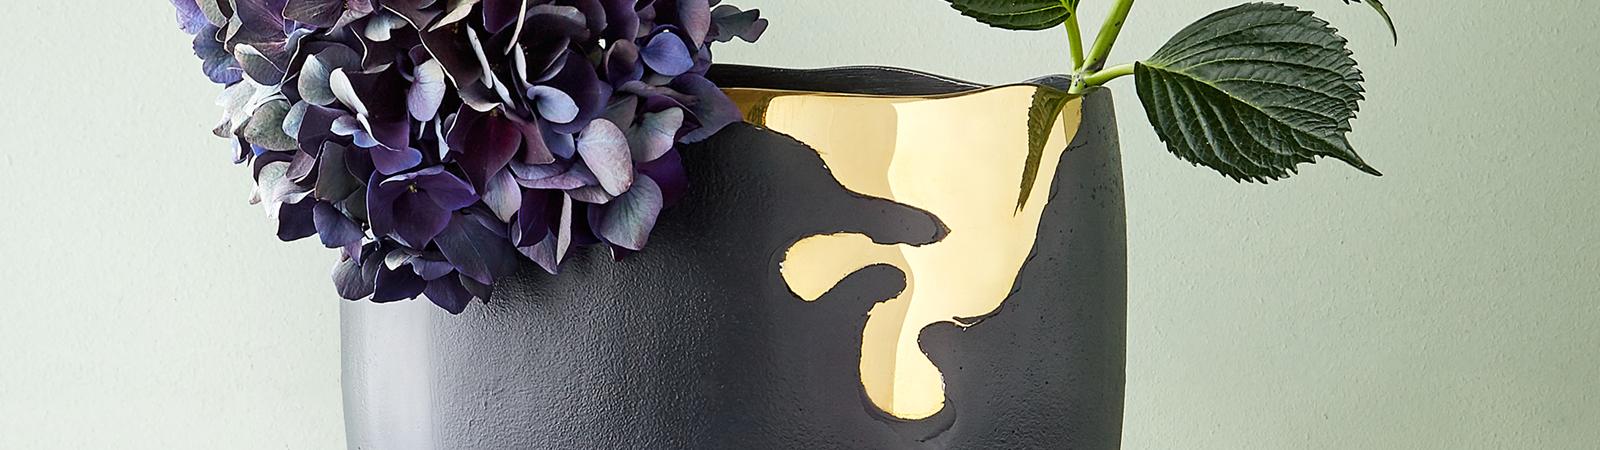 Lambert Vasen & Gefäße